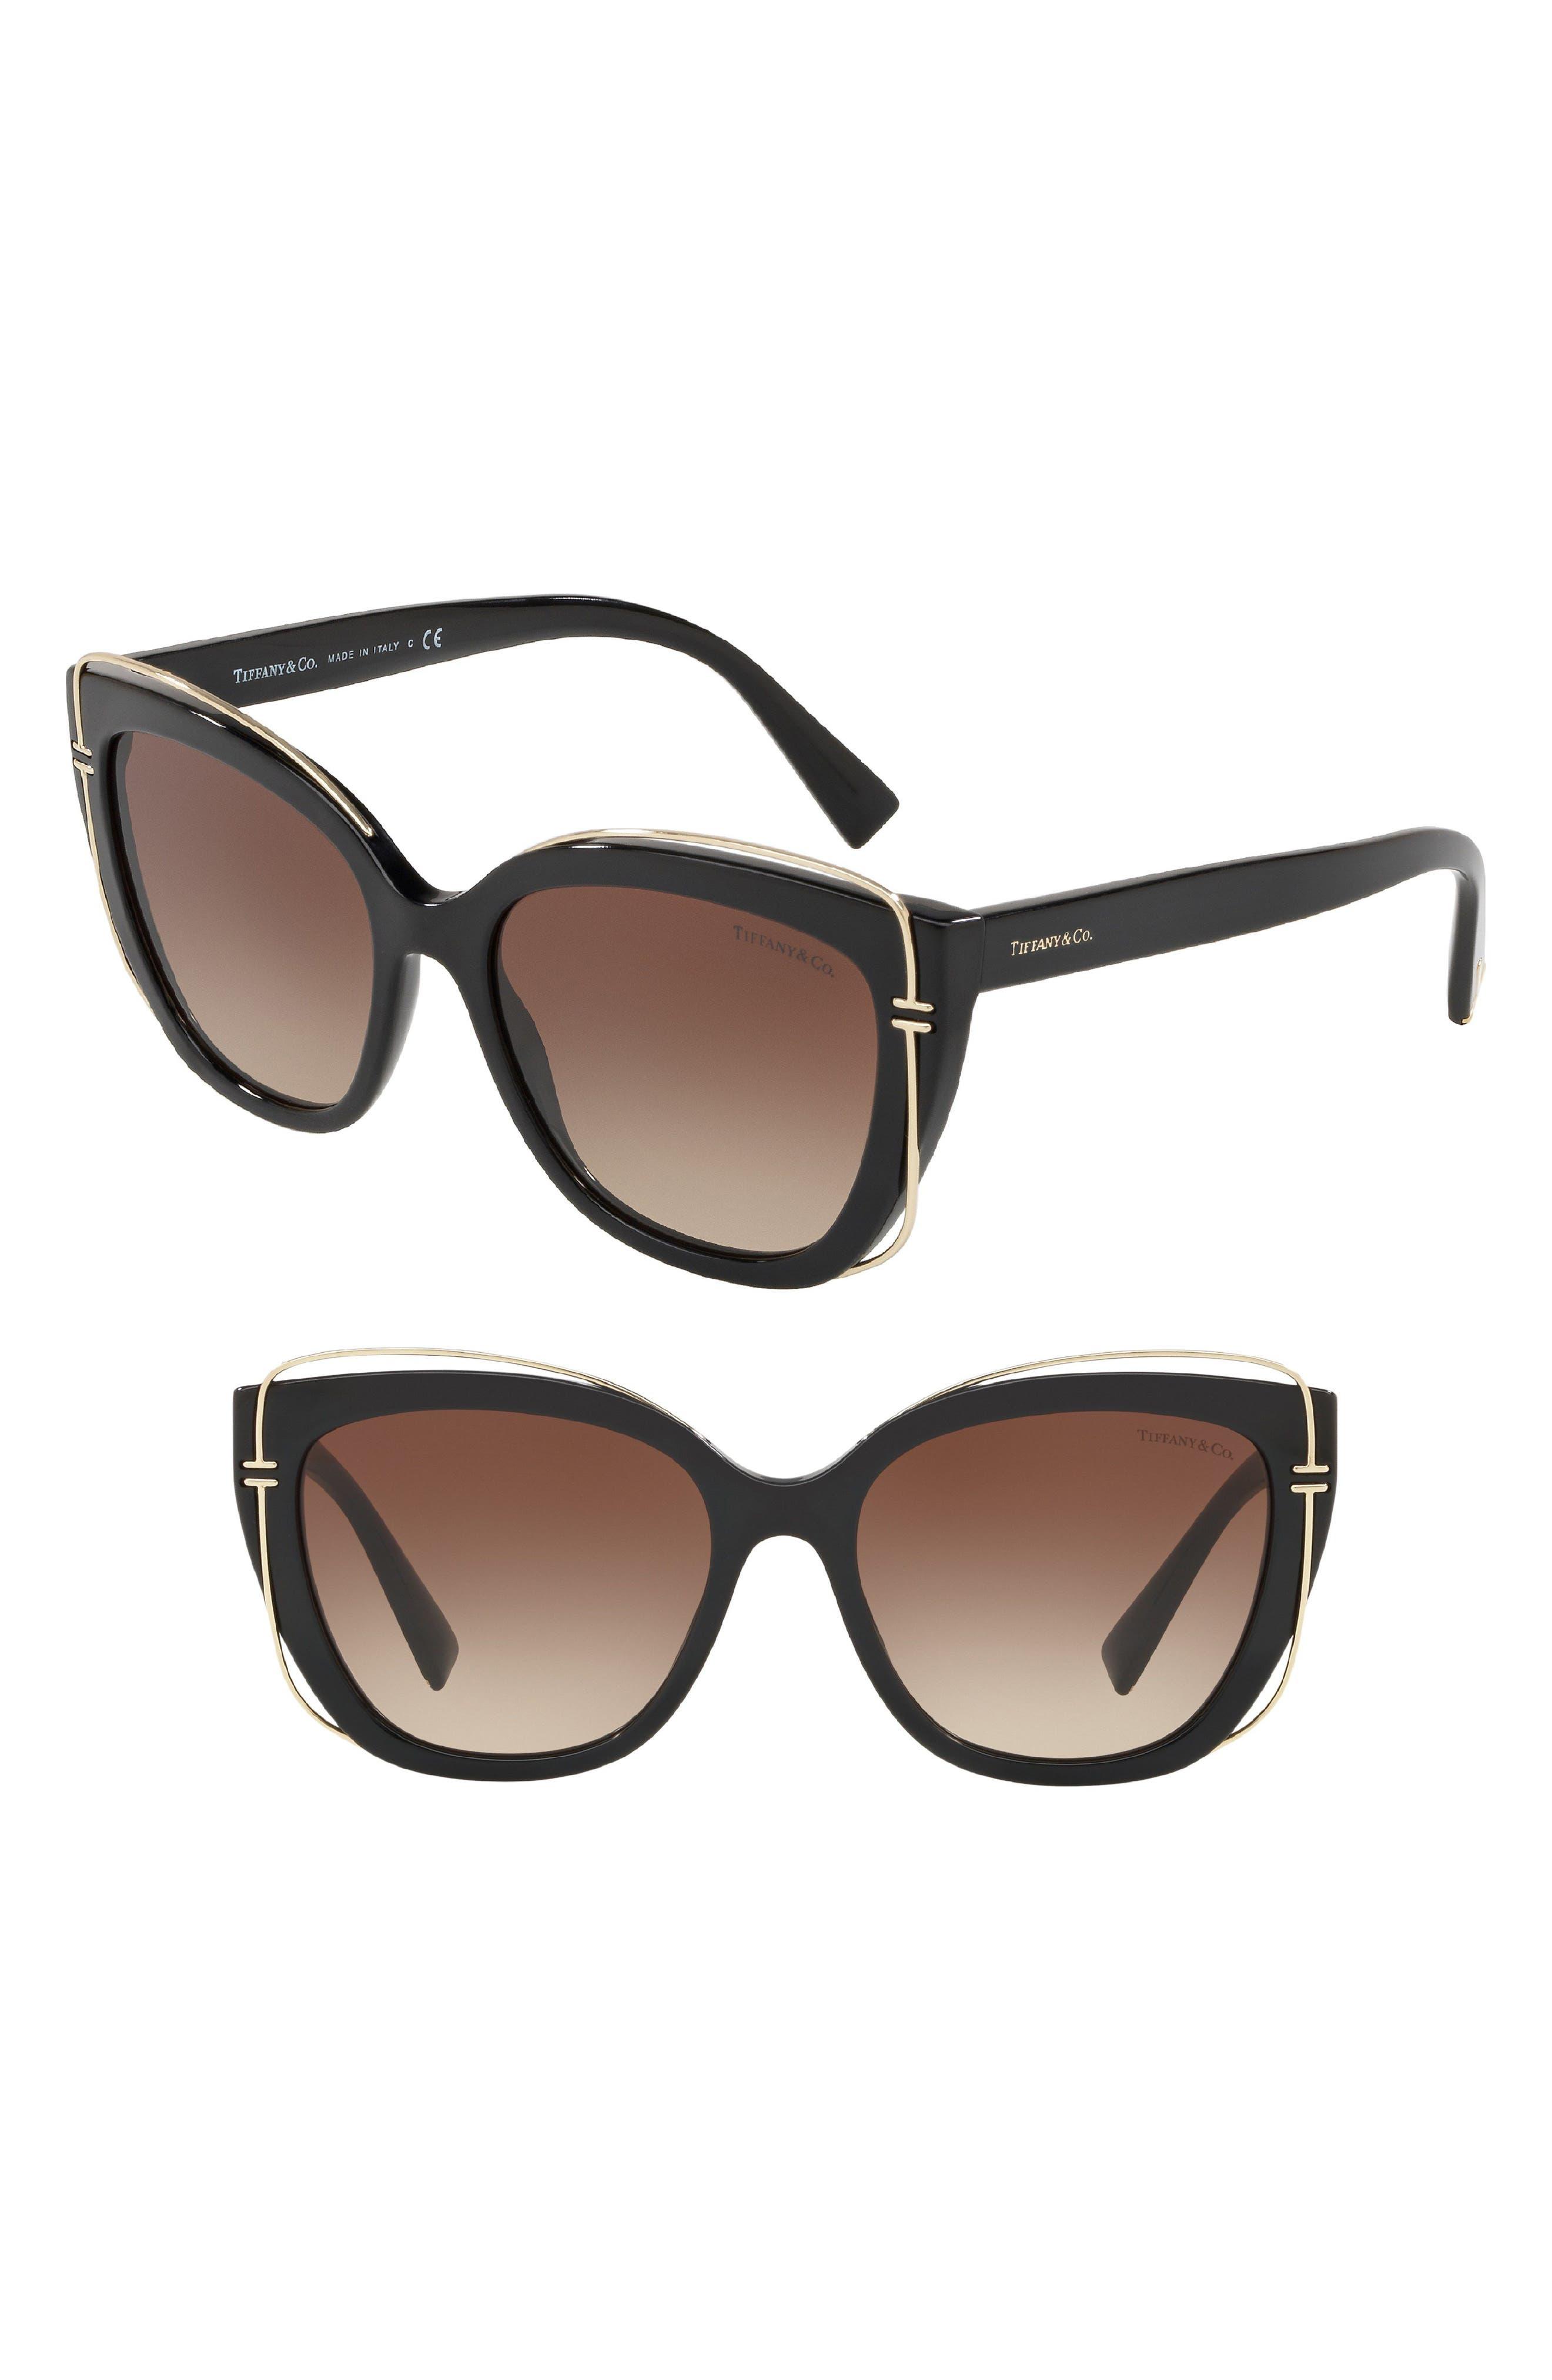 54mm Gradient Cat Eye Sunglasses,                             Main thumbnail 1, color,                             BLACK GRADIENT